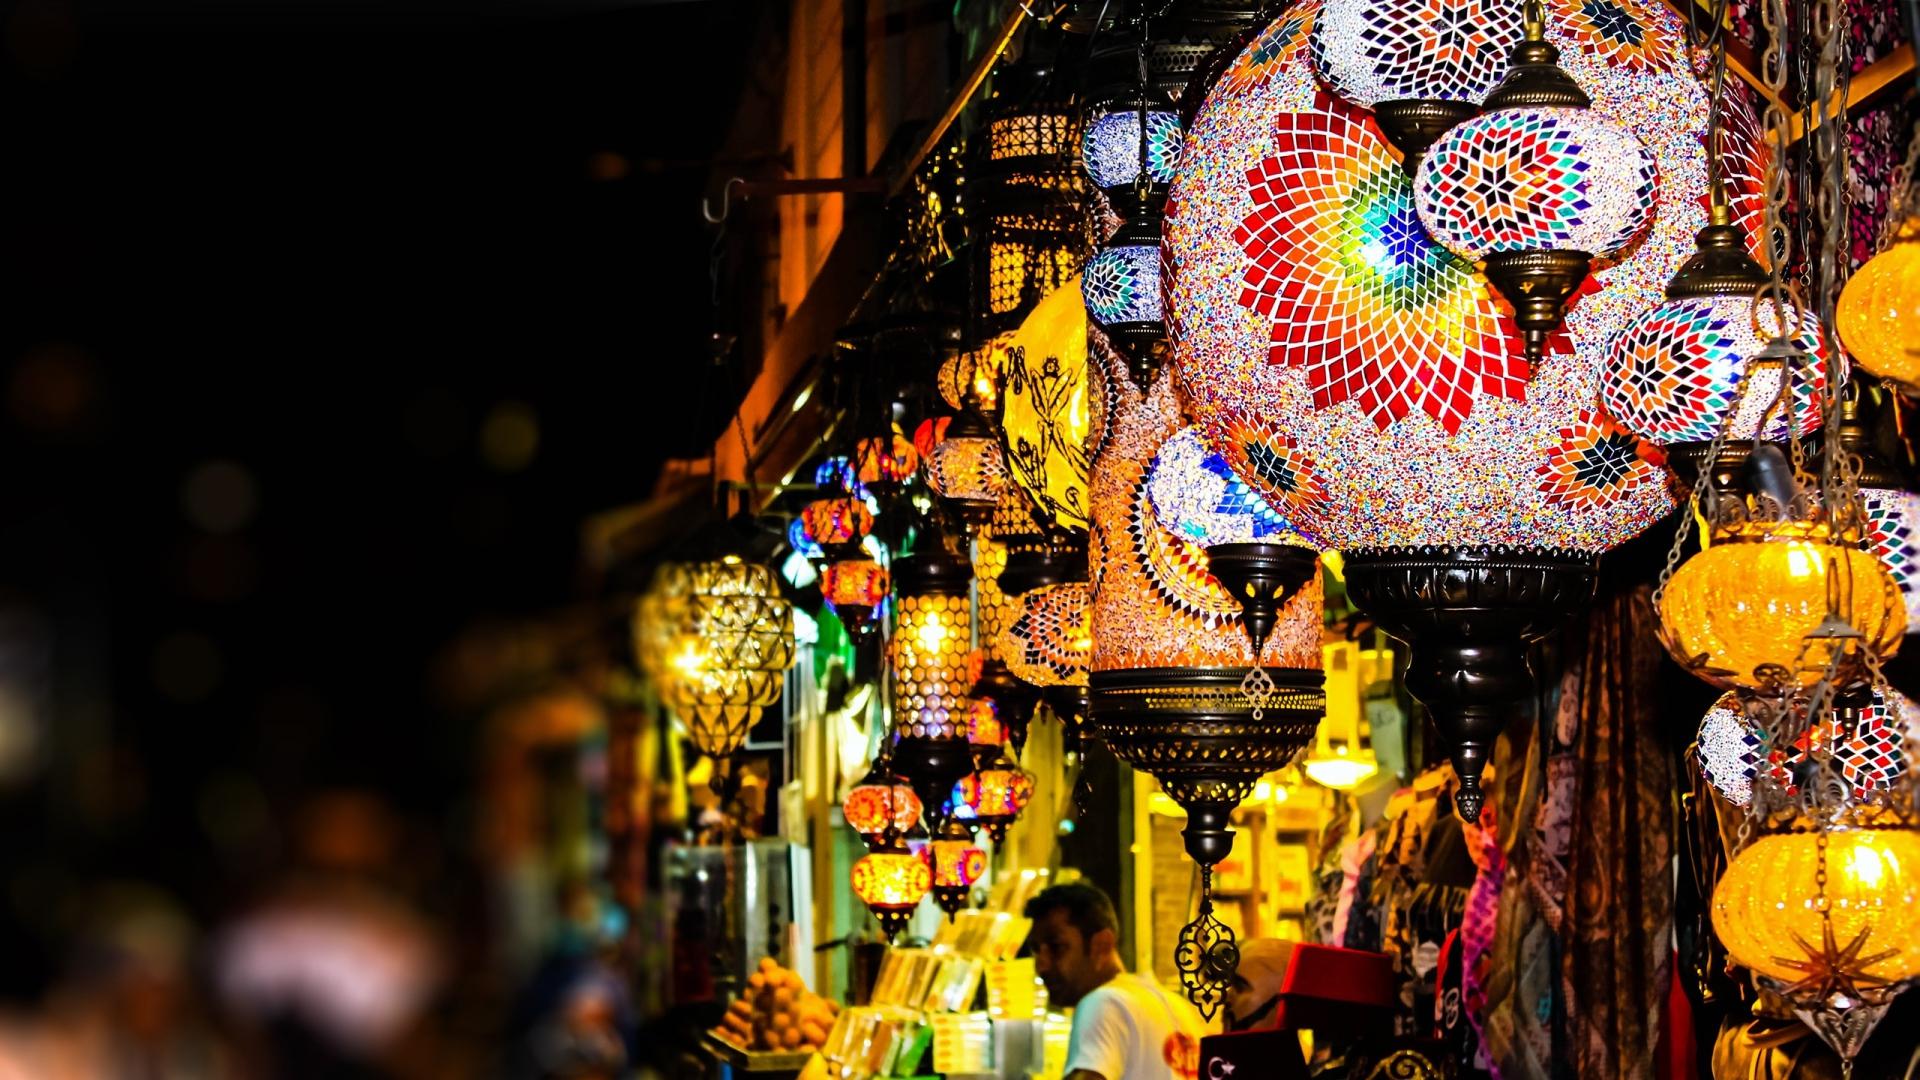 Popular Wallpaper Night Lantern - china_lanterns_colorful_night_64605_1920x1080  Perfect Image Reference-913472.jpg